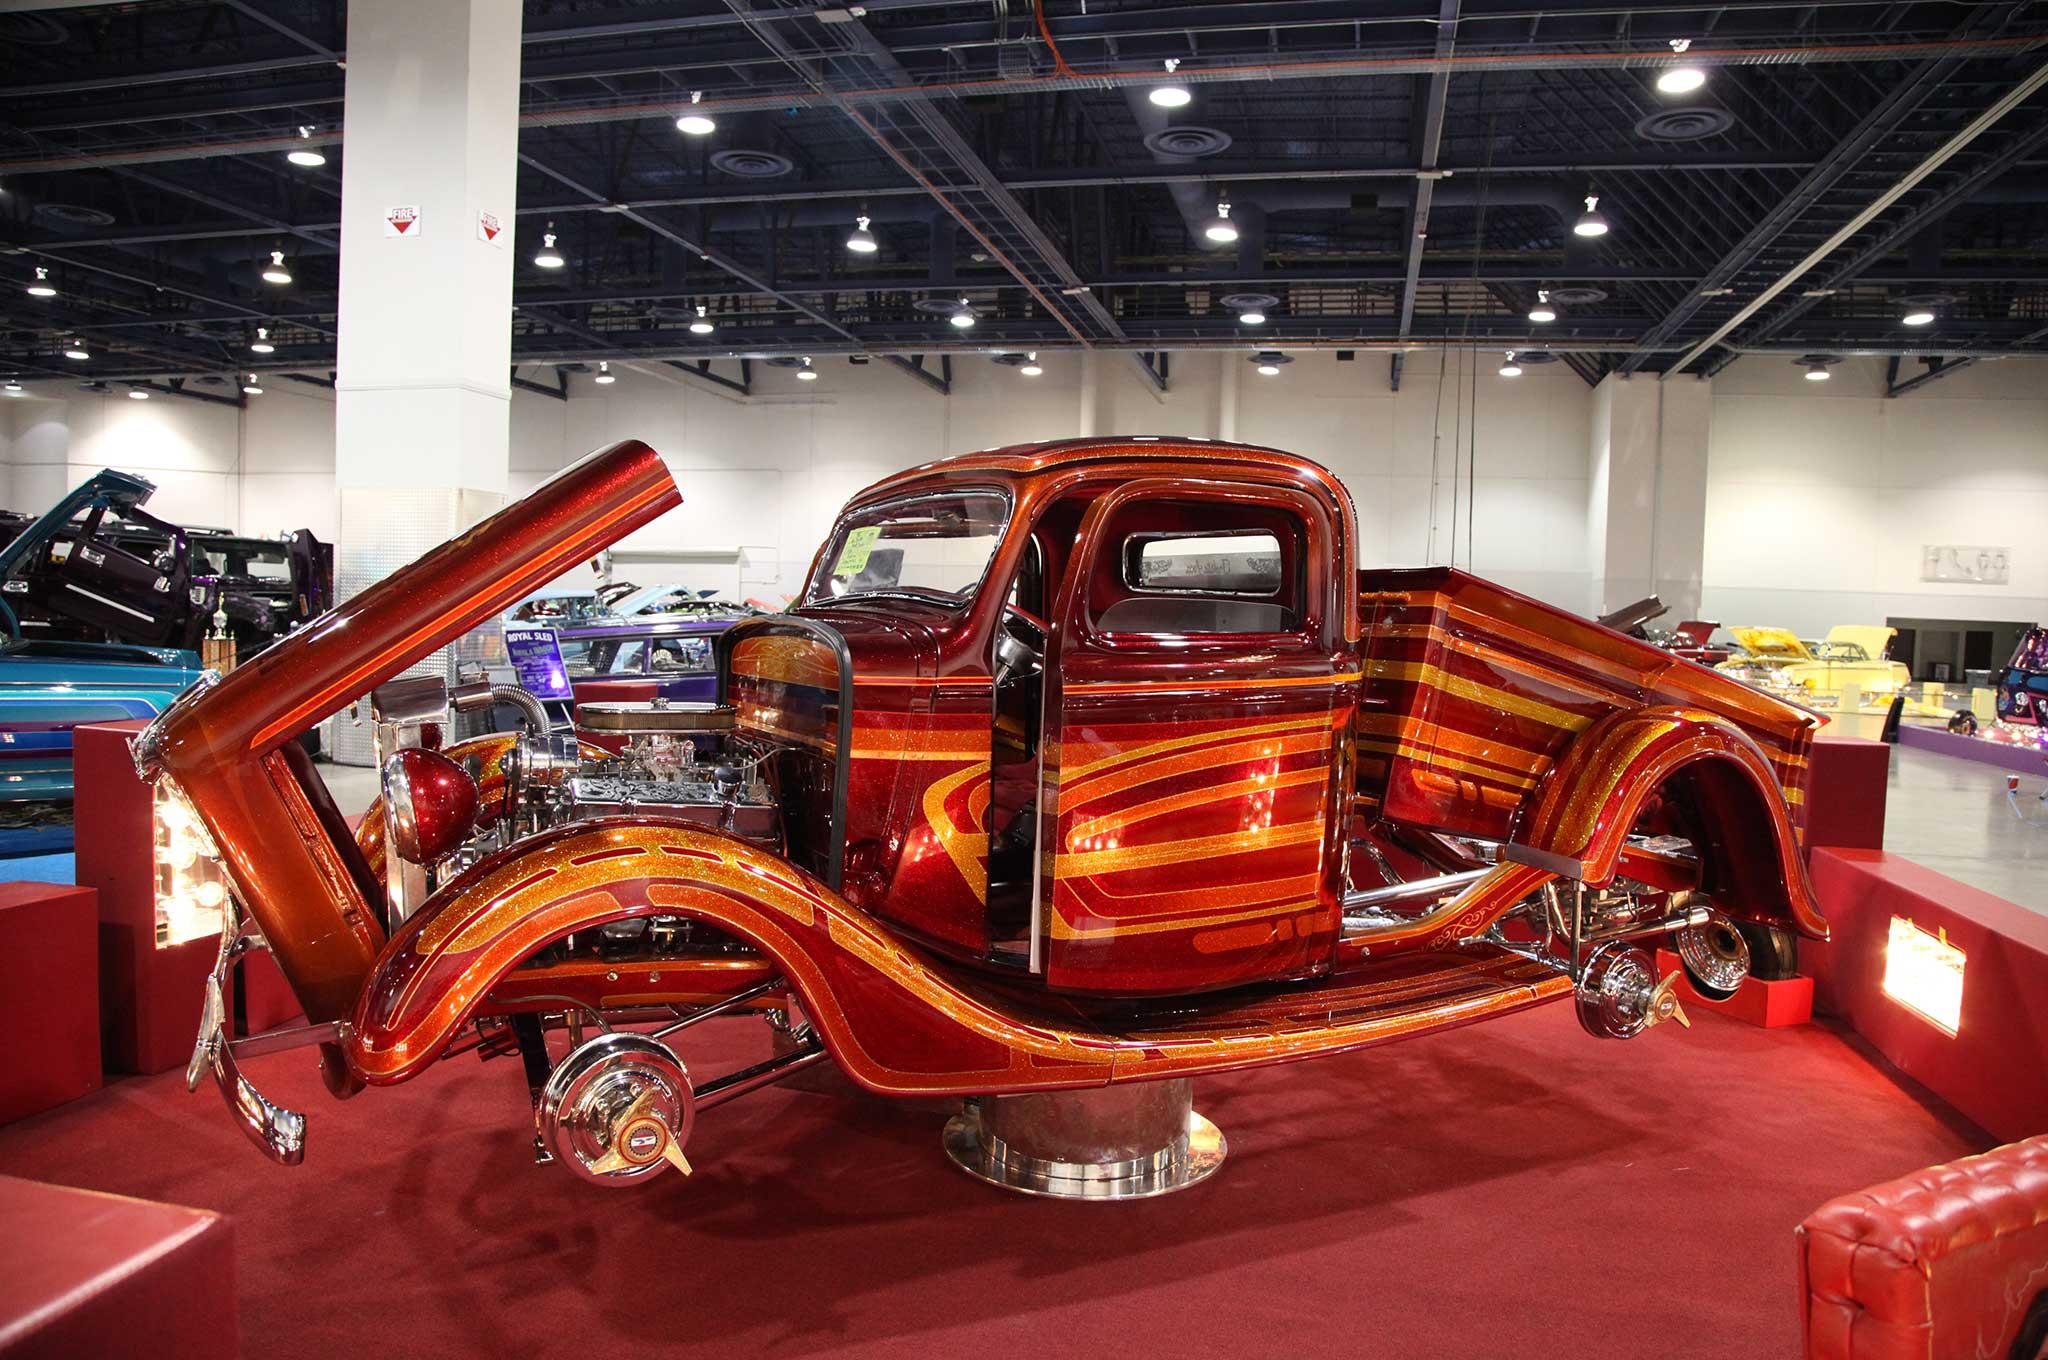 2015-las-vegas-super-show-winners-sal-sierra-1936-chevy